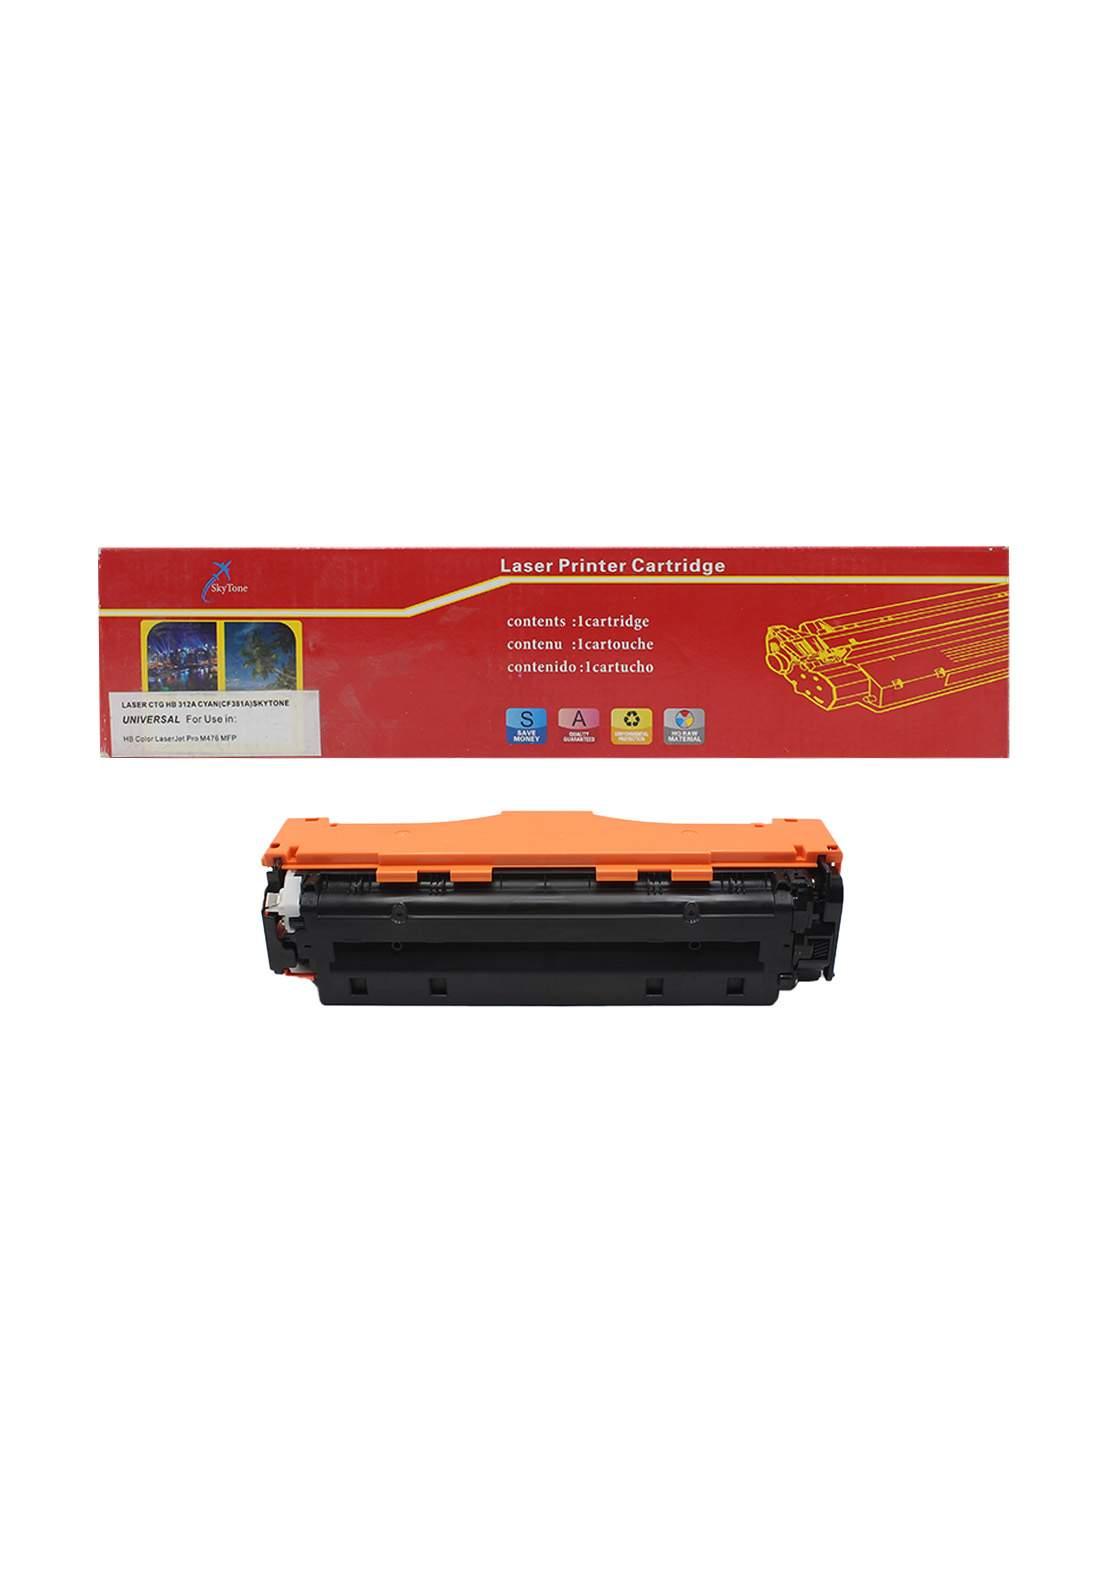 SKYTONE CTG HP 312A (CF381A) Universal Laser Printer Toner Cartridge خرطوشة حبر